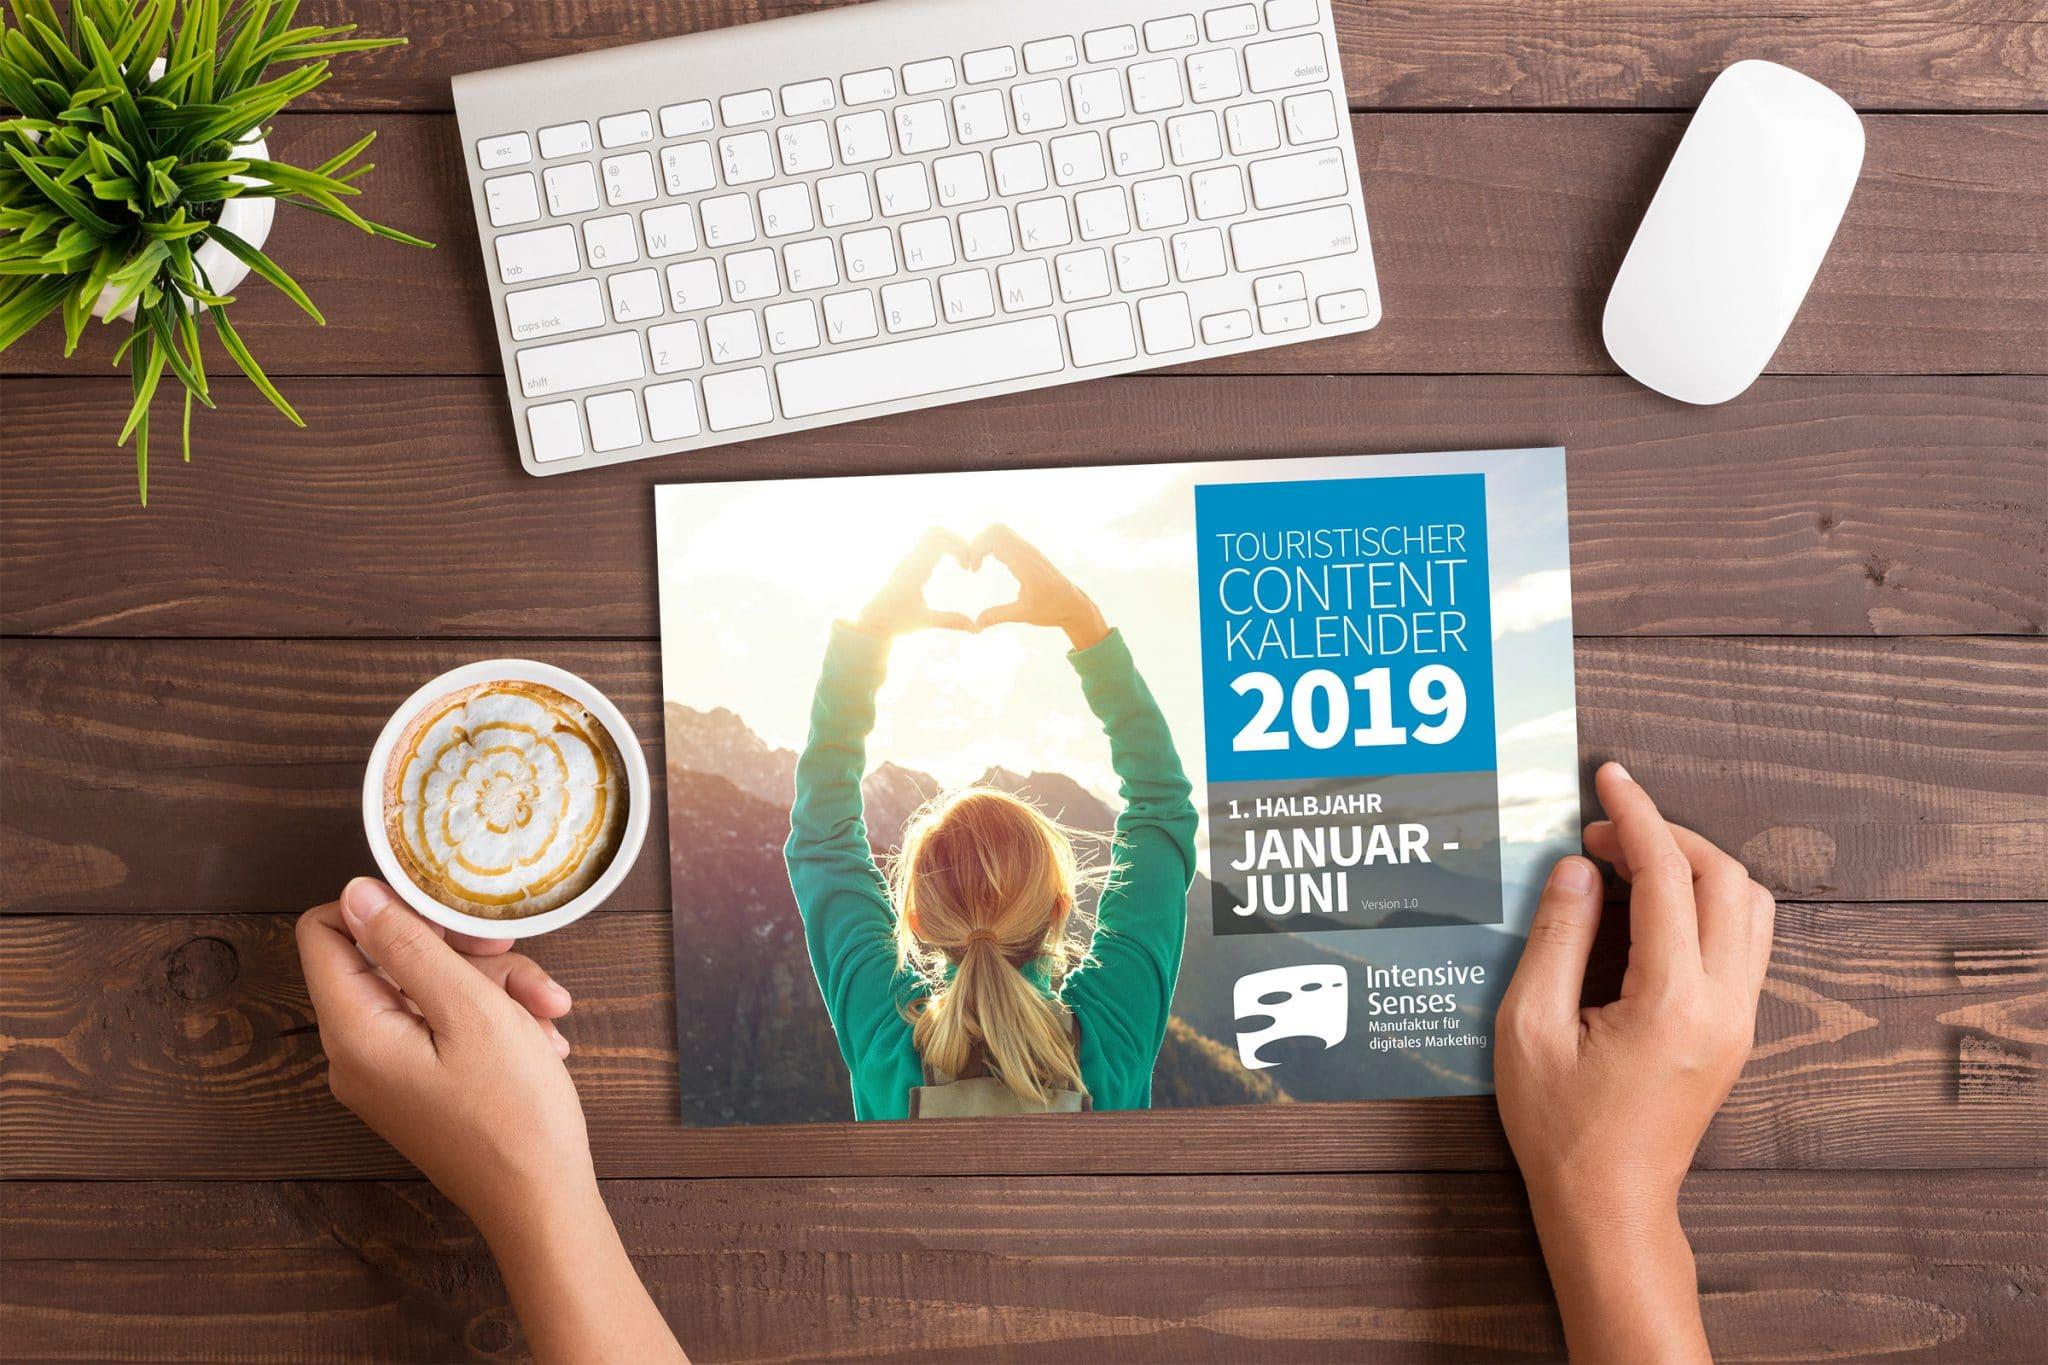 Contentkalender Tourismus 2019